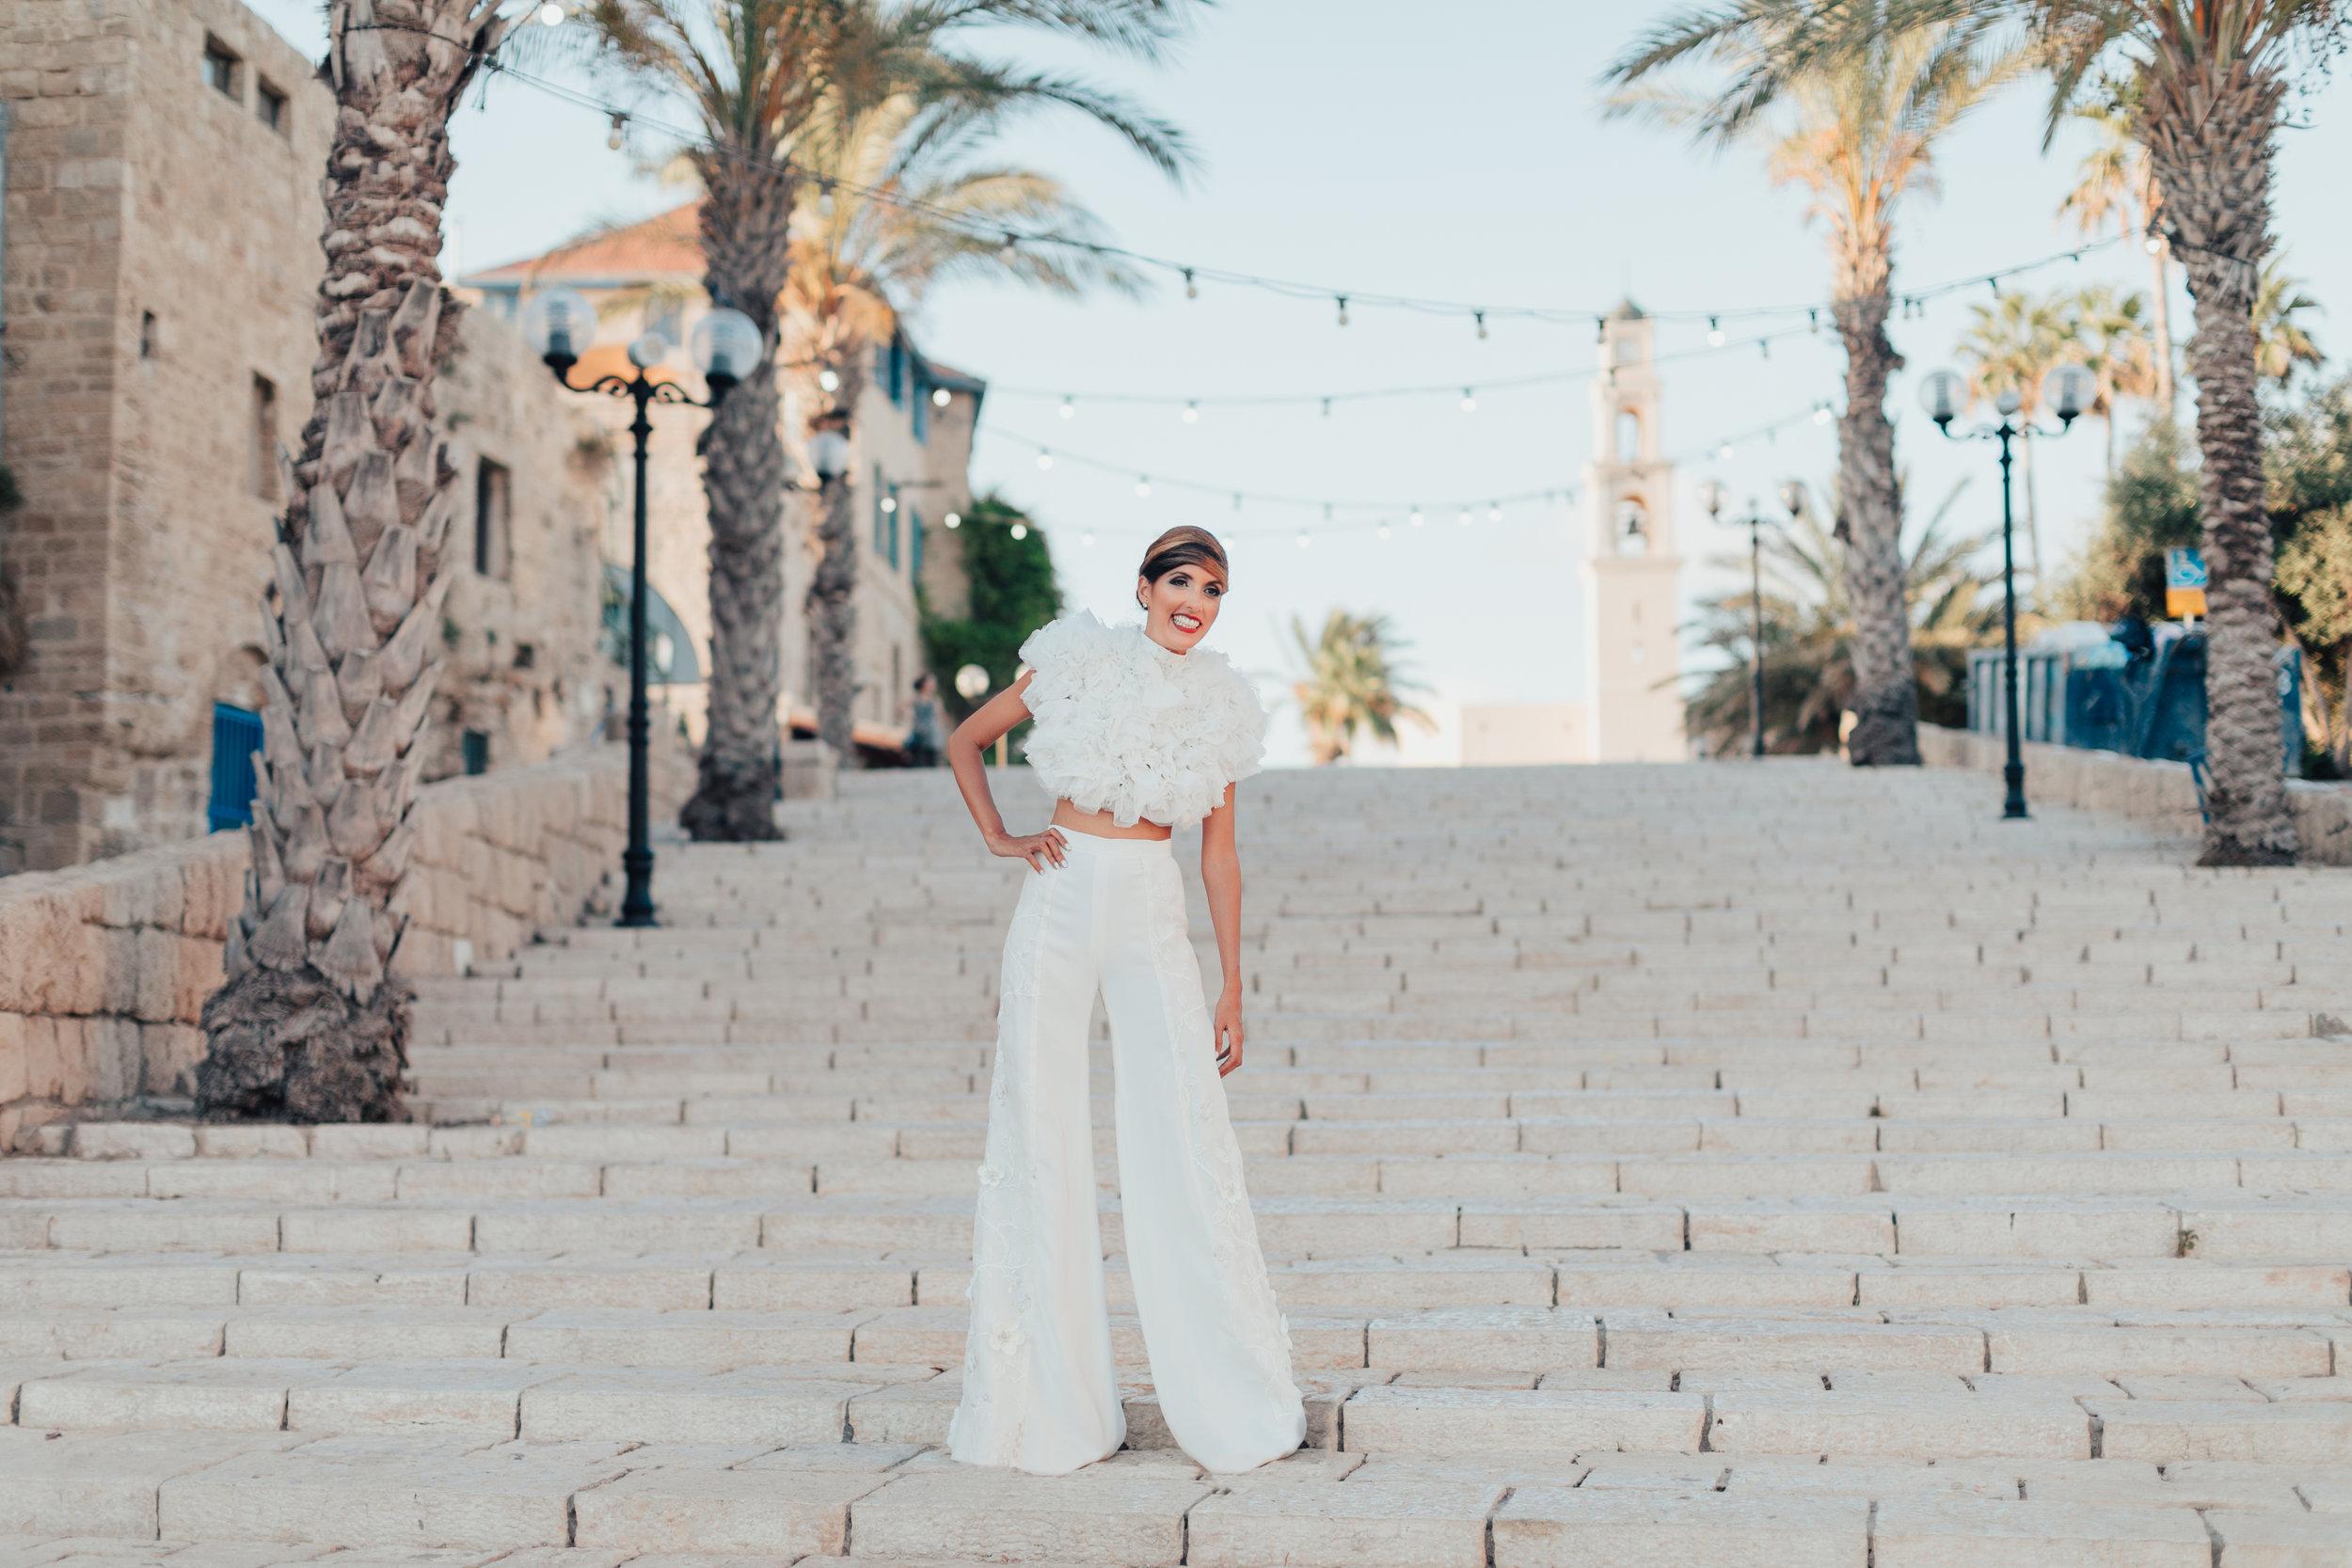 Anée Atelier Israel Nathalie Kraynina Bride 5